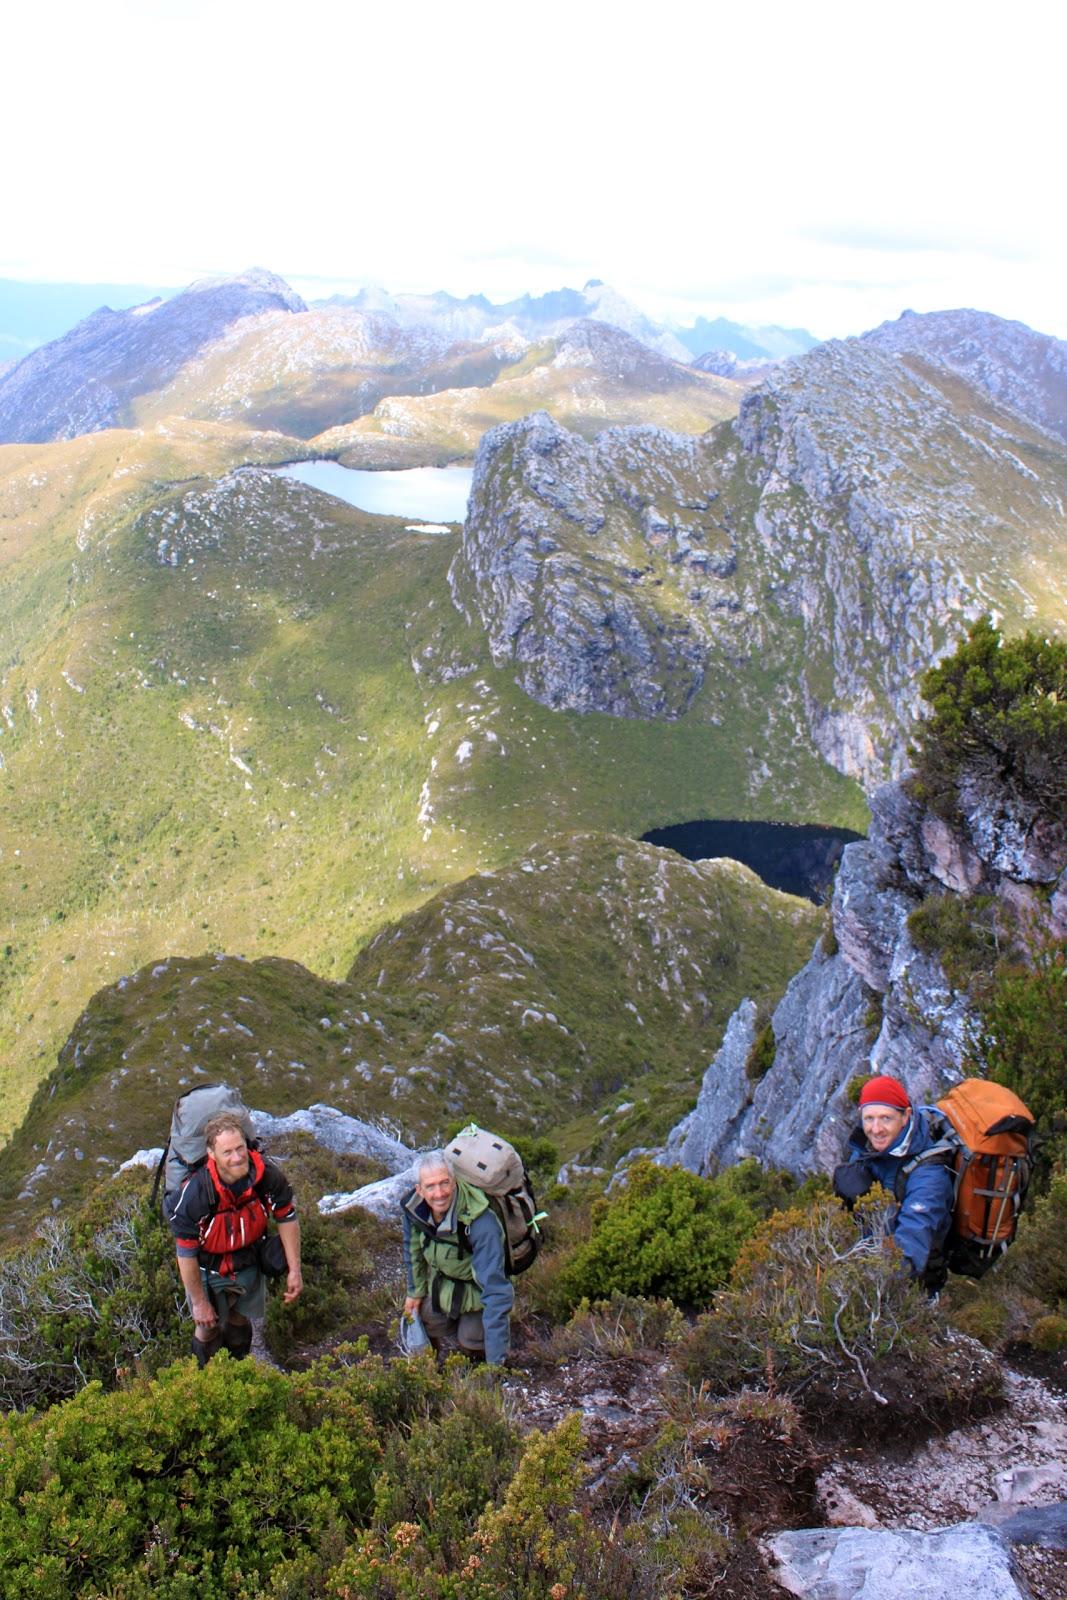 Outdoor activities, High Country, Victoria, Australia |Hiking Australia